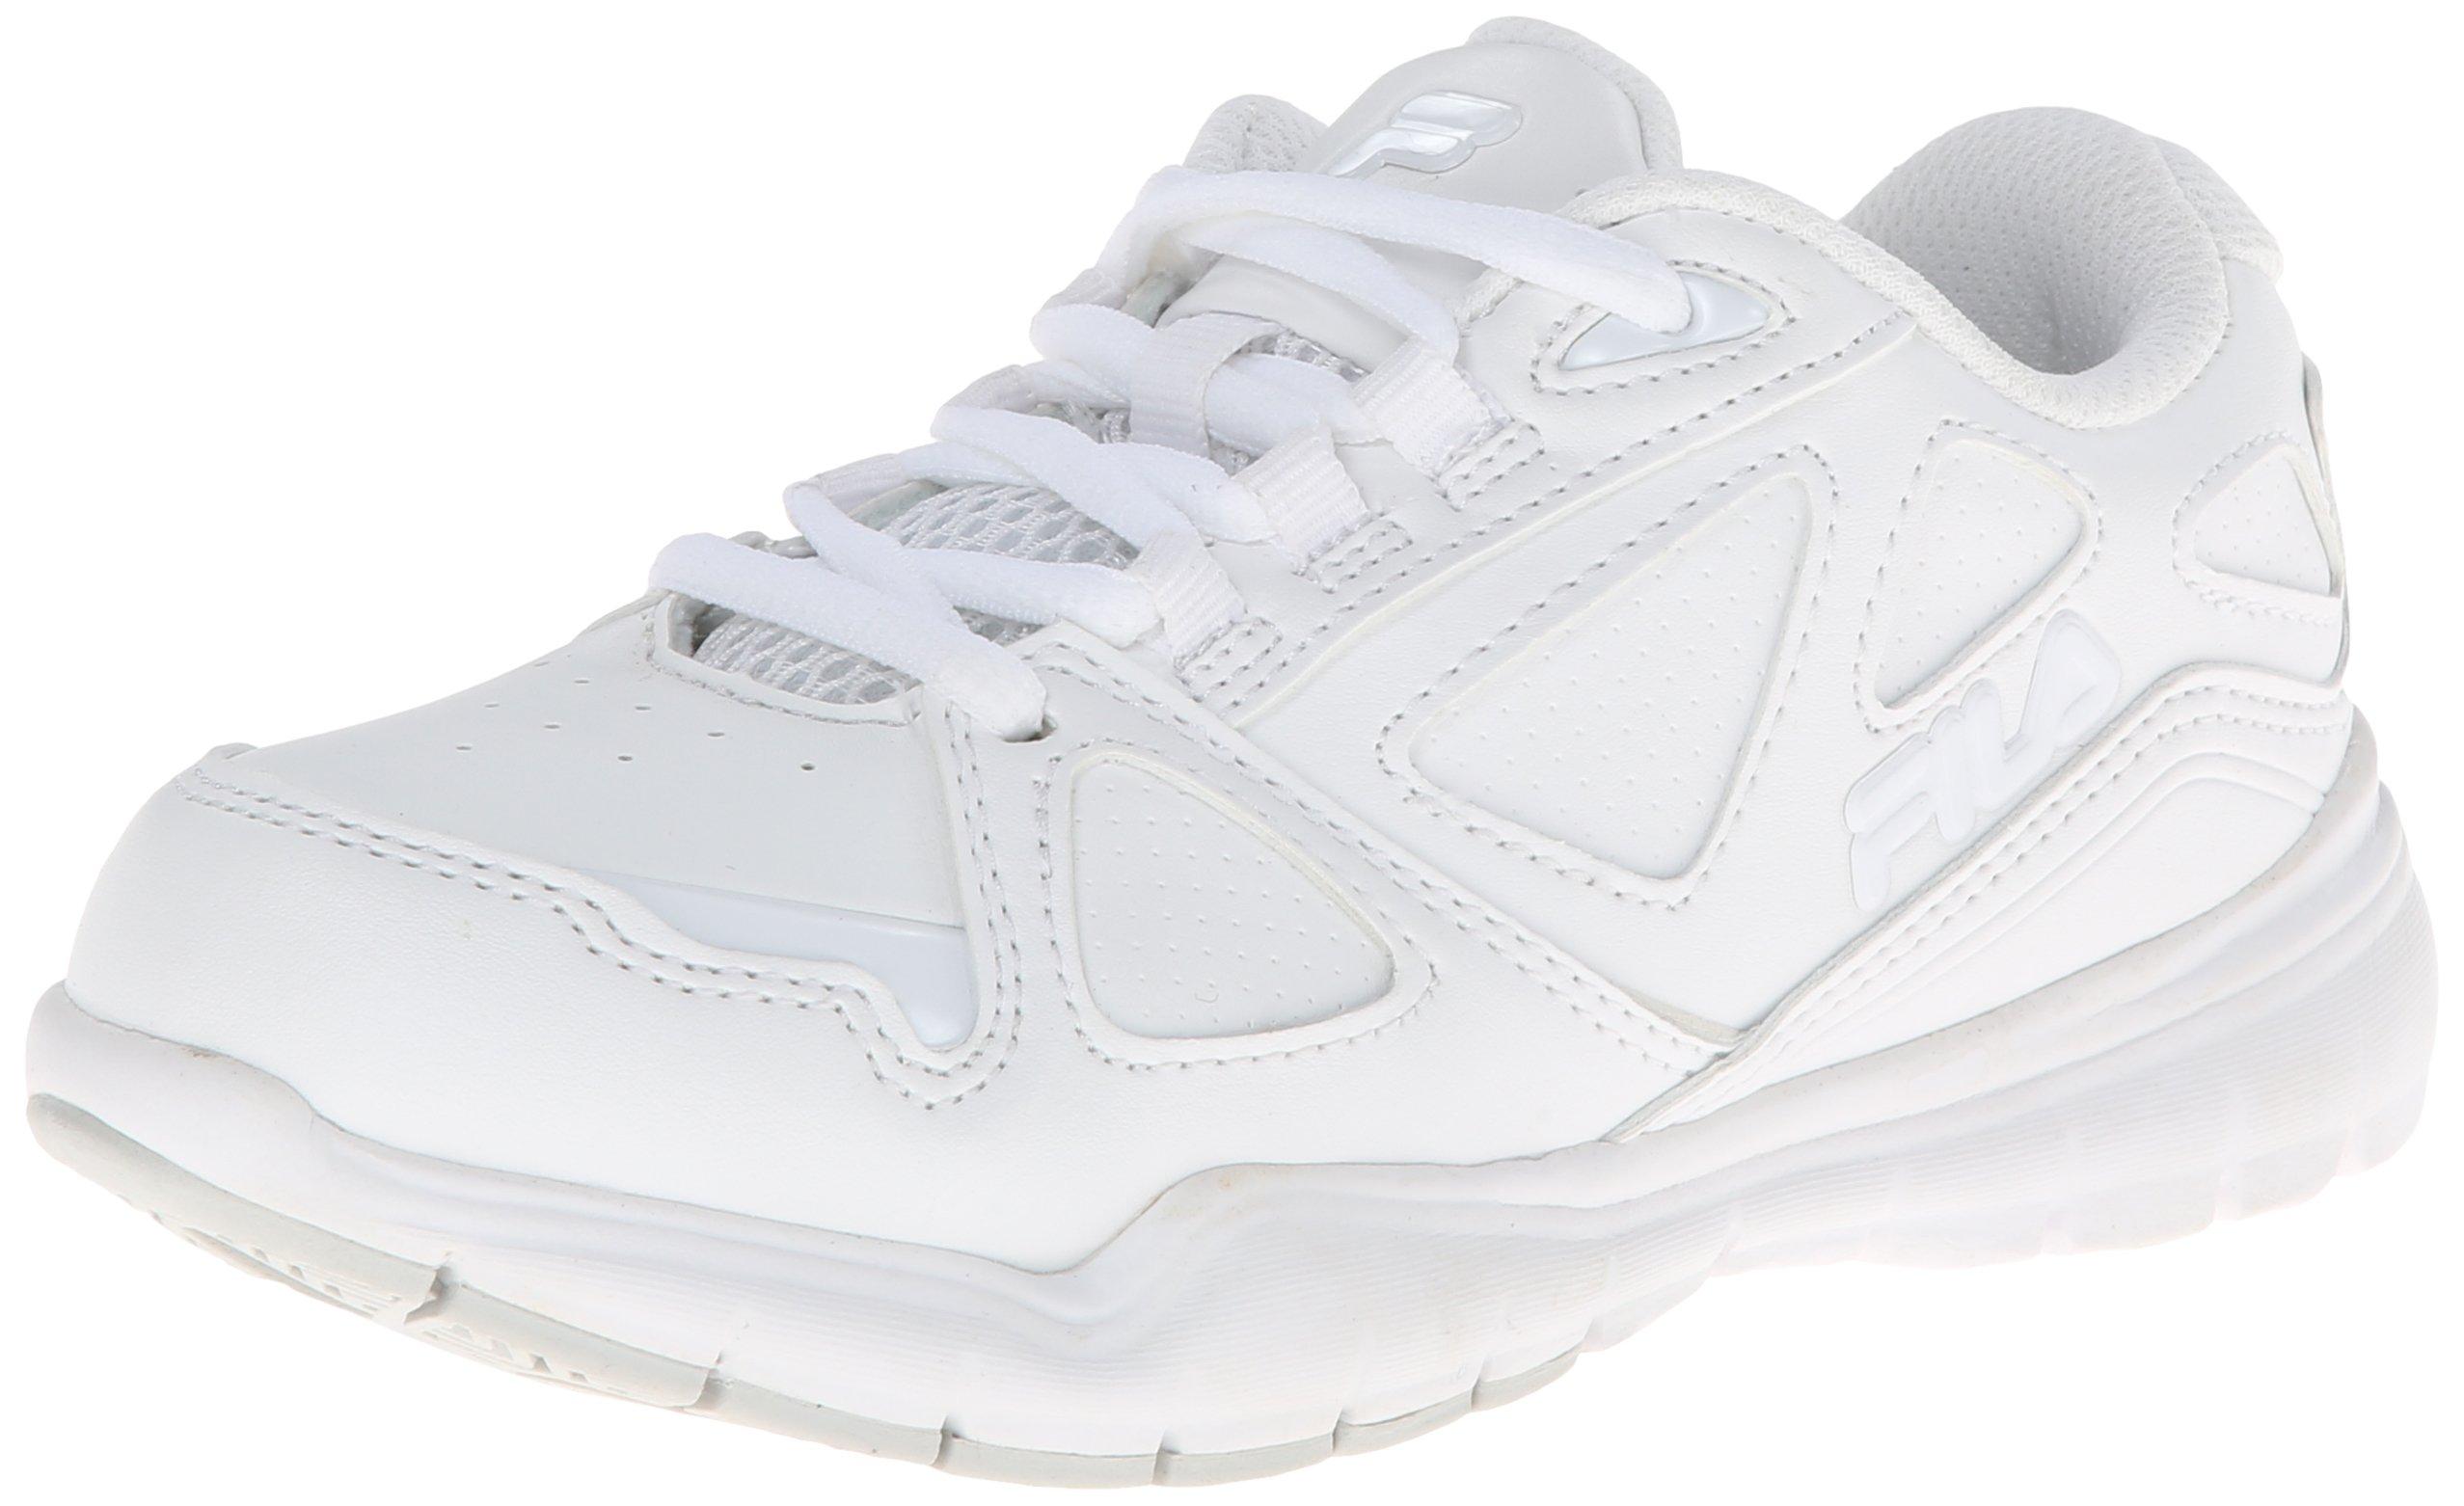 Fila Side-By-Side Training Shoe (Little Kid/Big Kid),White/White/White,6 M US Big Kid